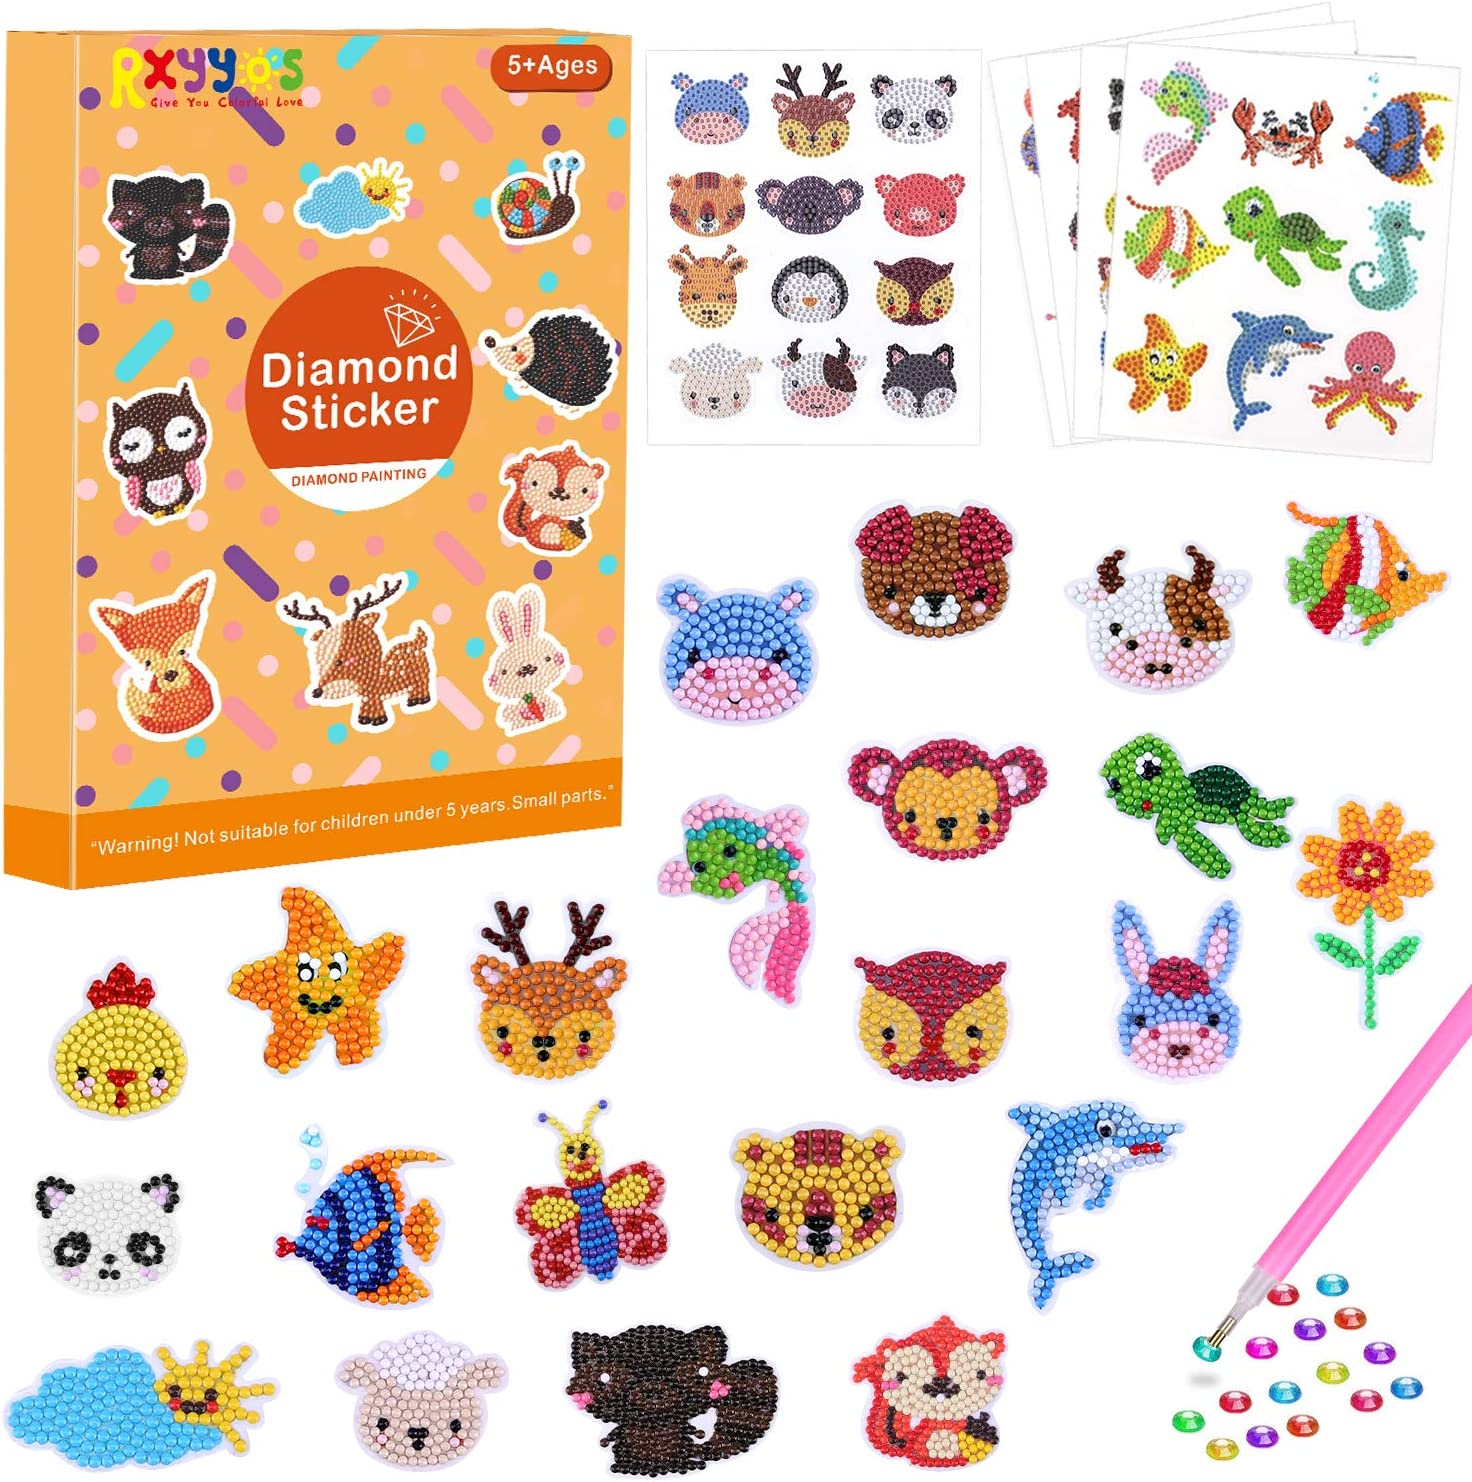 Junboys 49Pcs Diamond Painting Stickers Kits for Kids DIY Animal Diamond Art Craft Mosaic Stickers Handmade Digital Diamond Paint for Children Adult Beginners